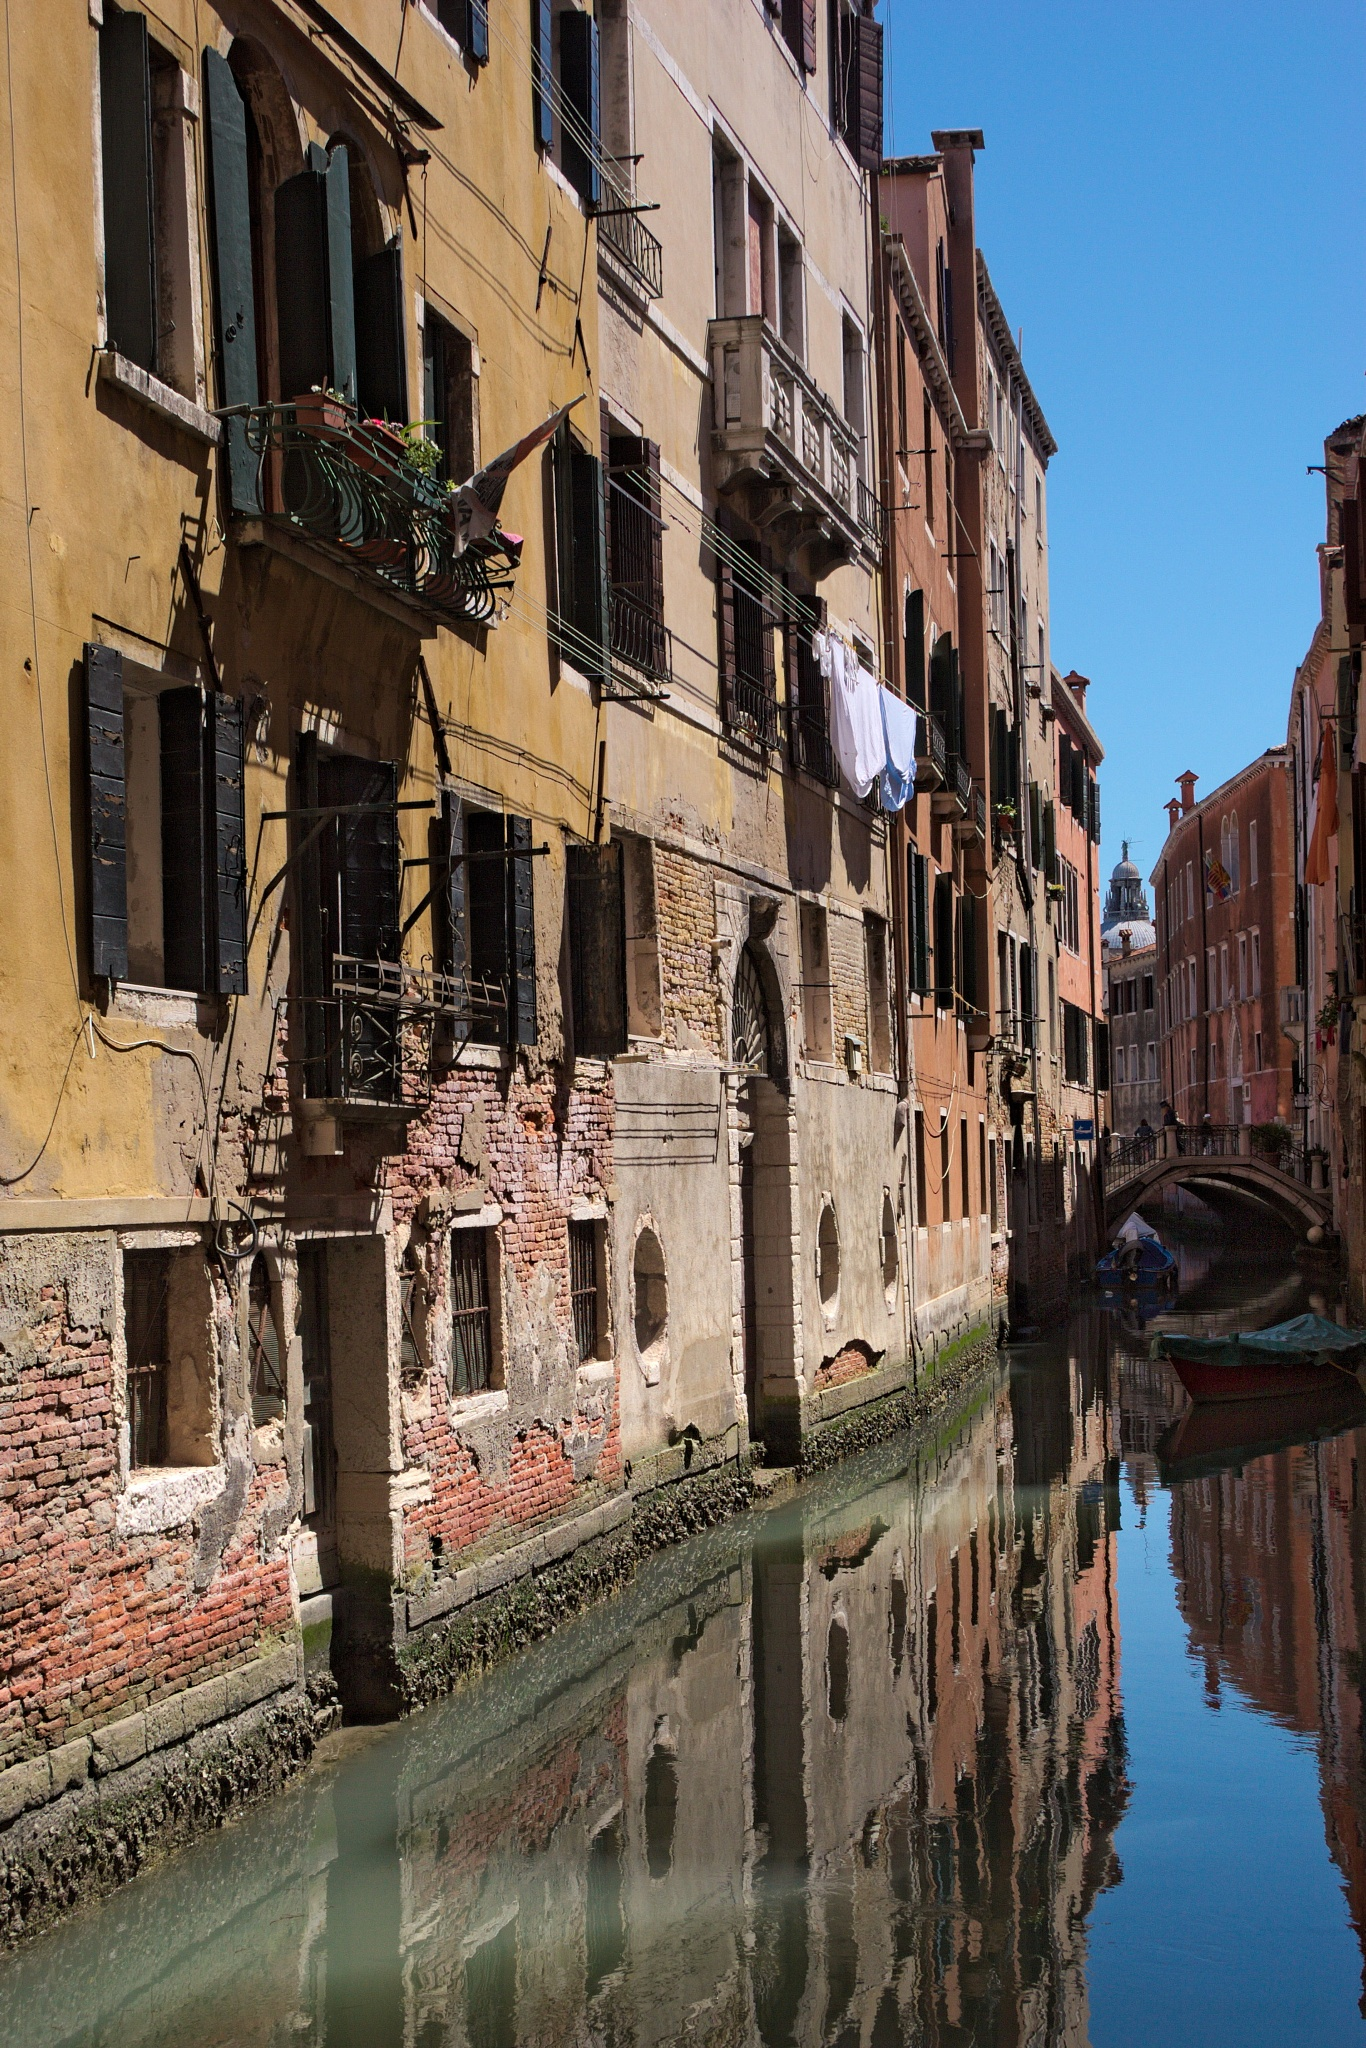 Somewhere inside Venice #5 by Alex Zalesny